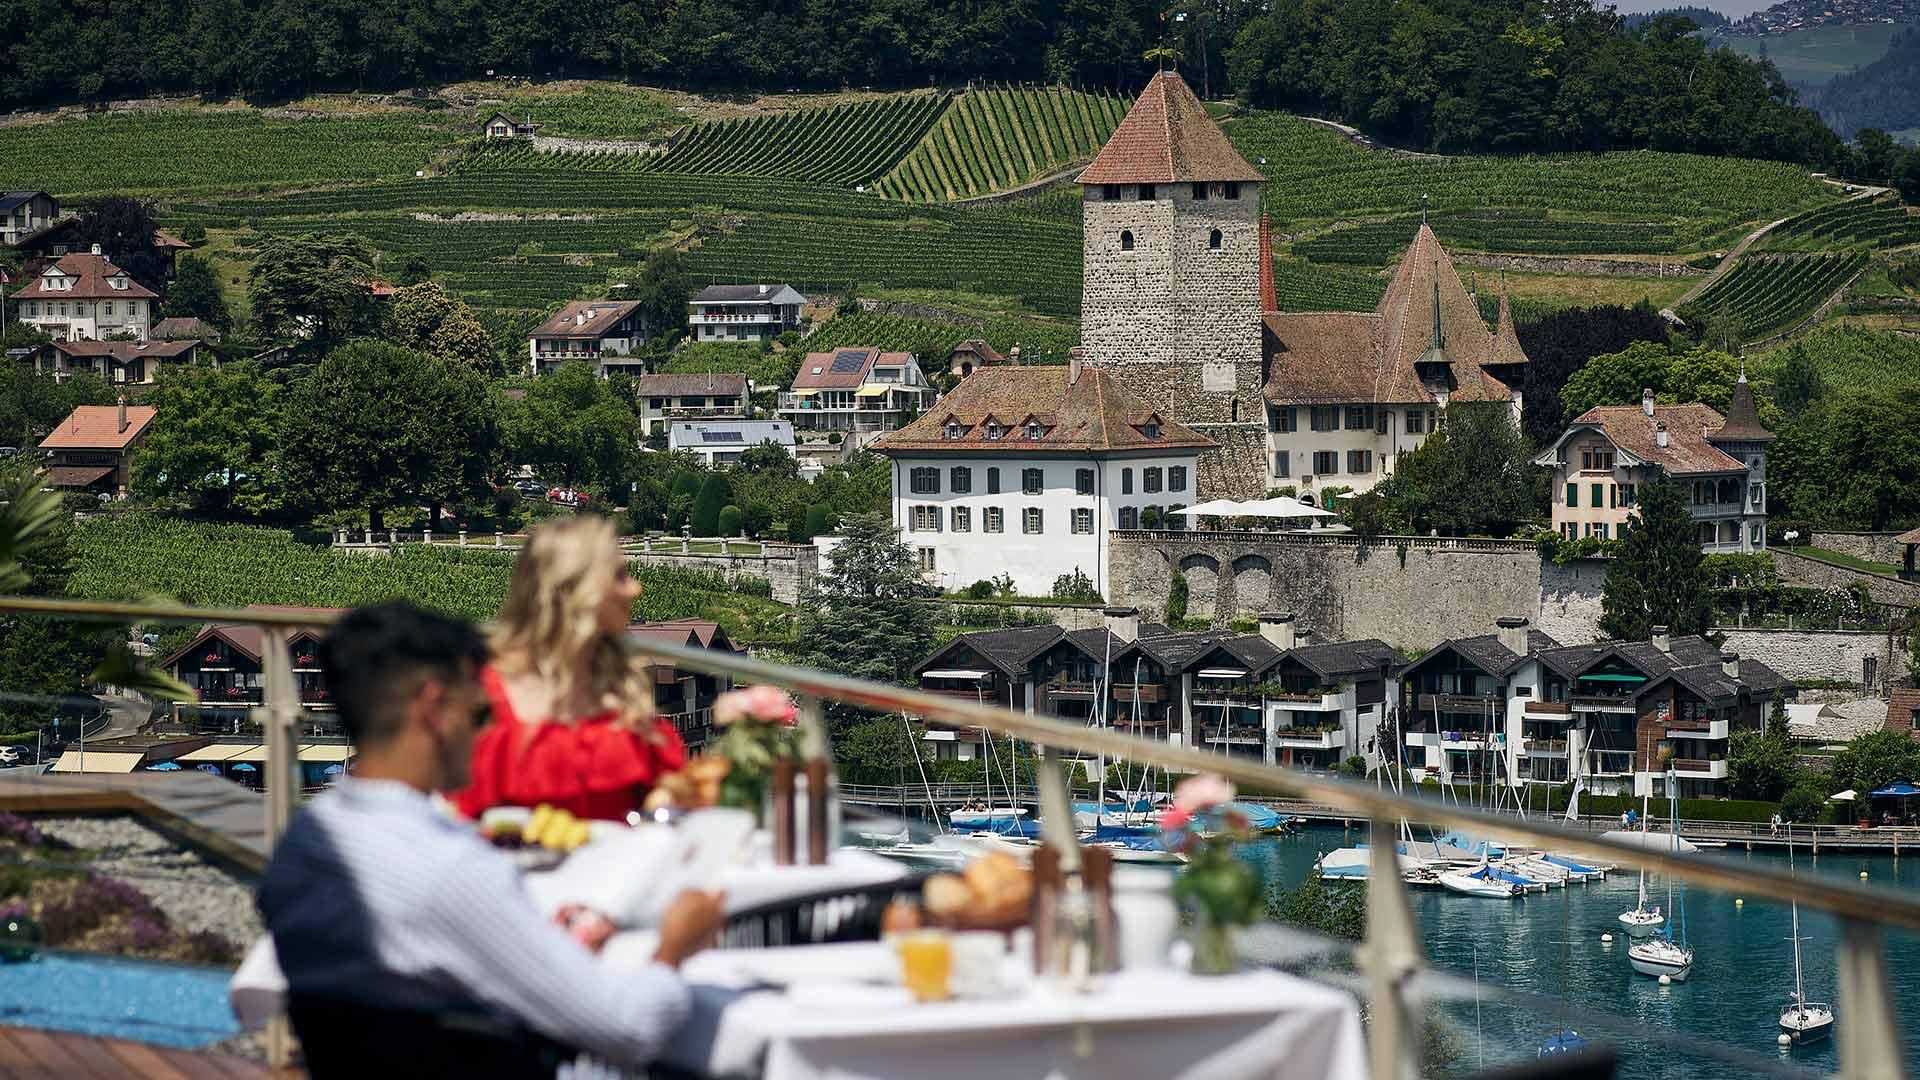 restaurant-belvedere-spiez-terrasse-par-aussicht-schloss-rebberg-bucht.jpg